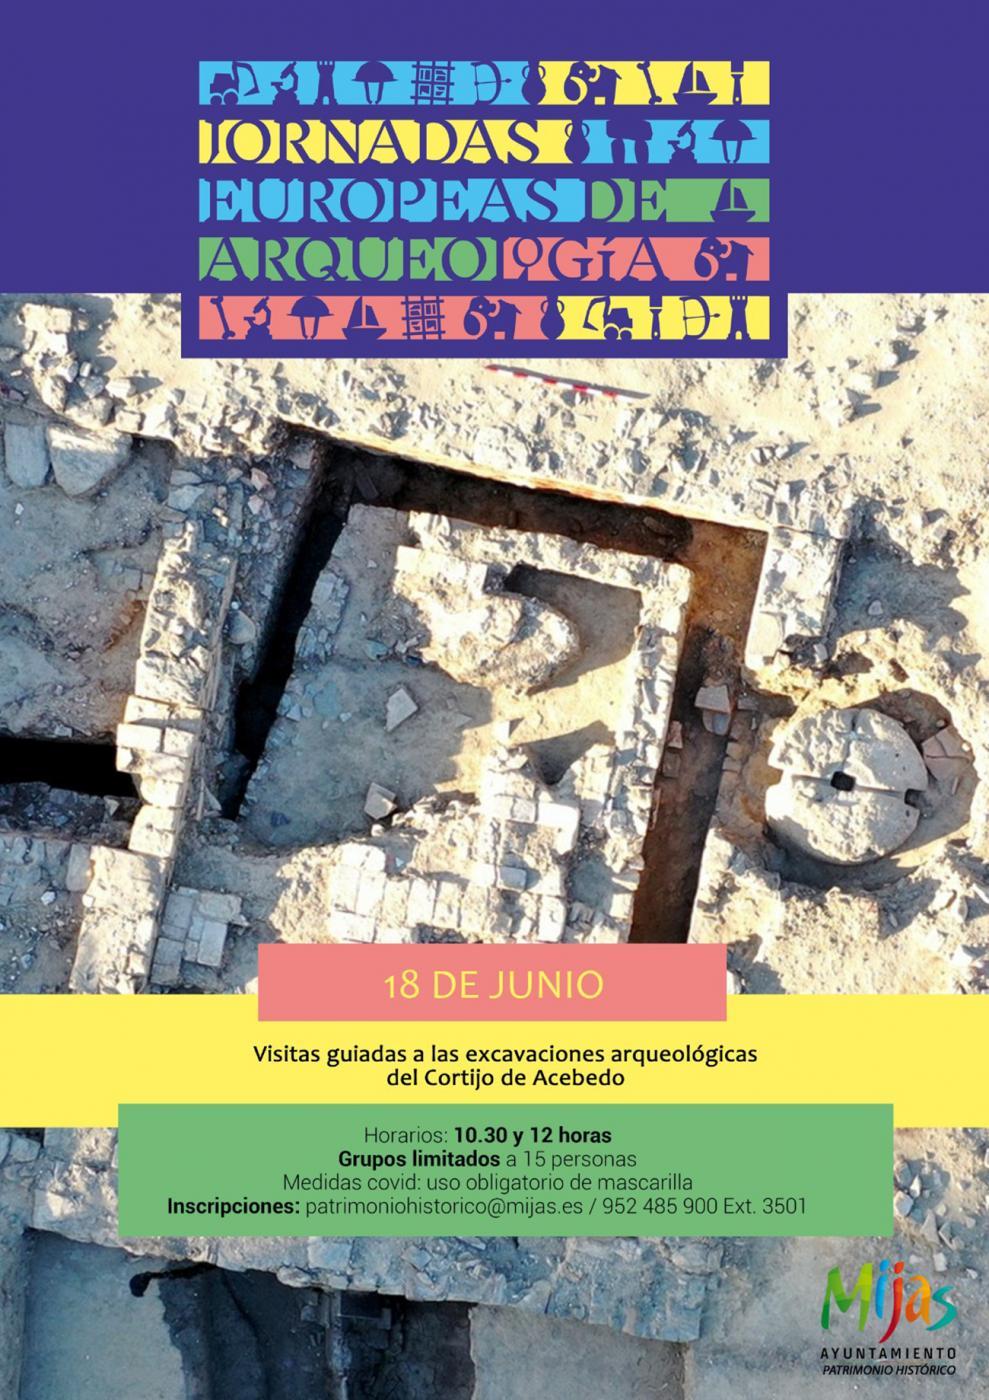 Cartel Jornadas Europeas de Arqueología.